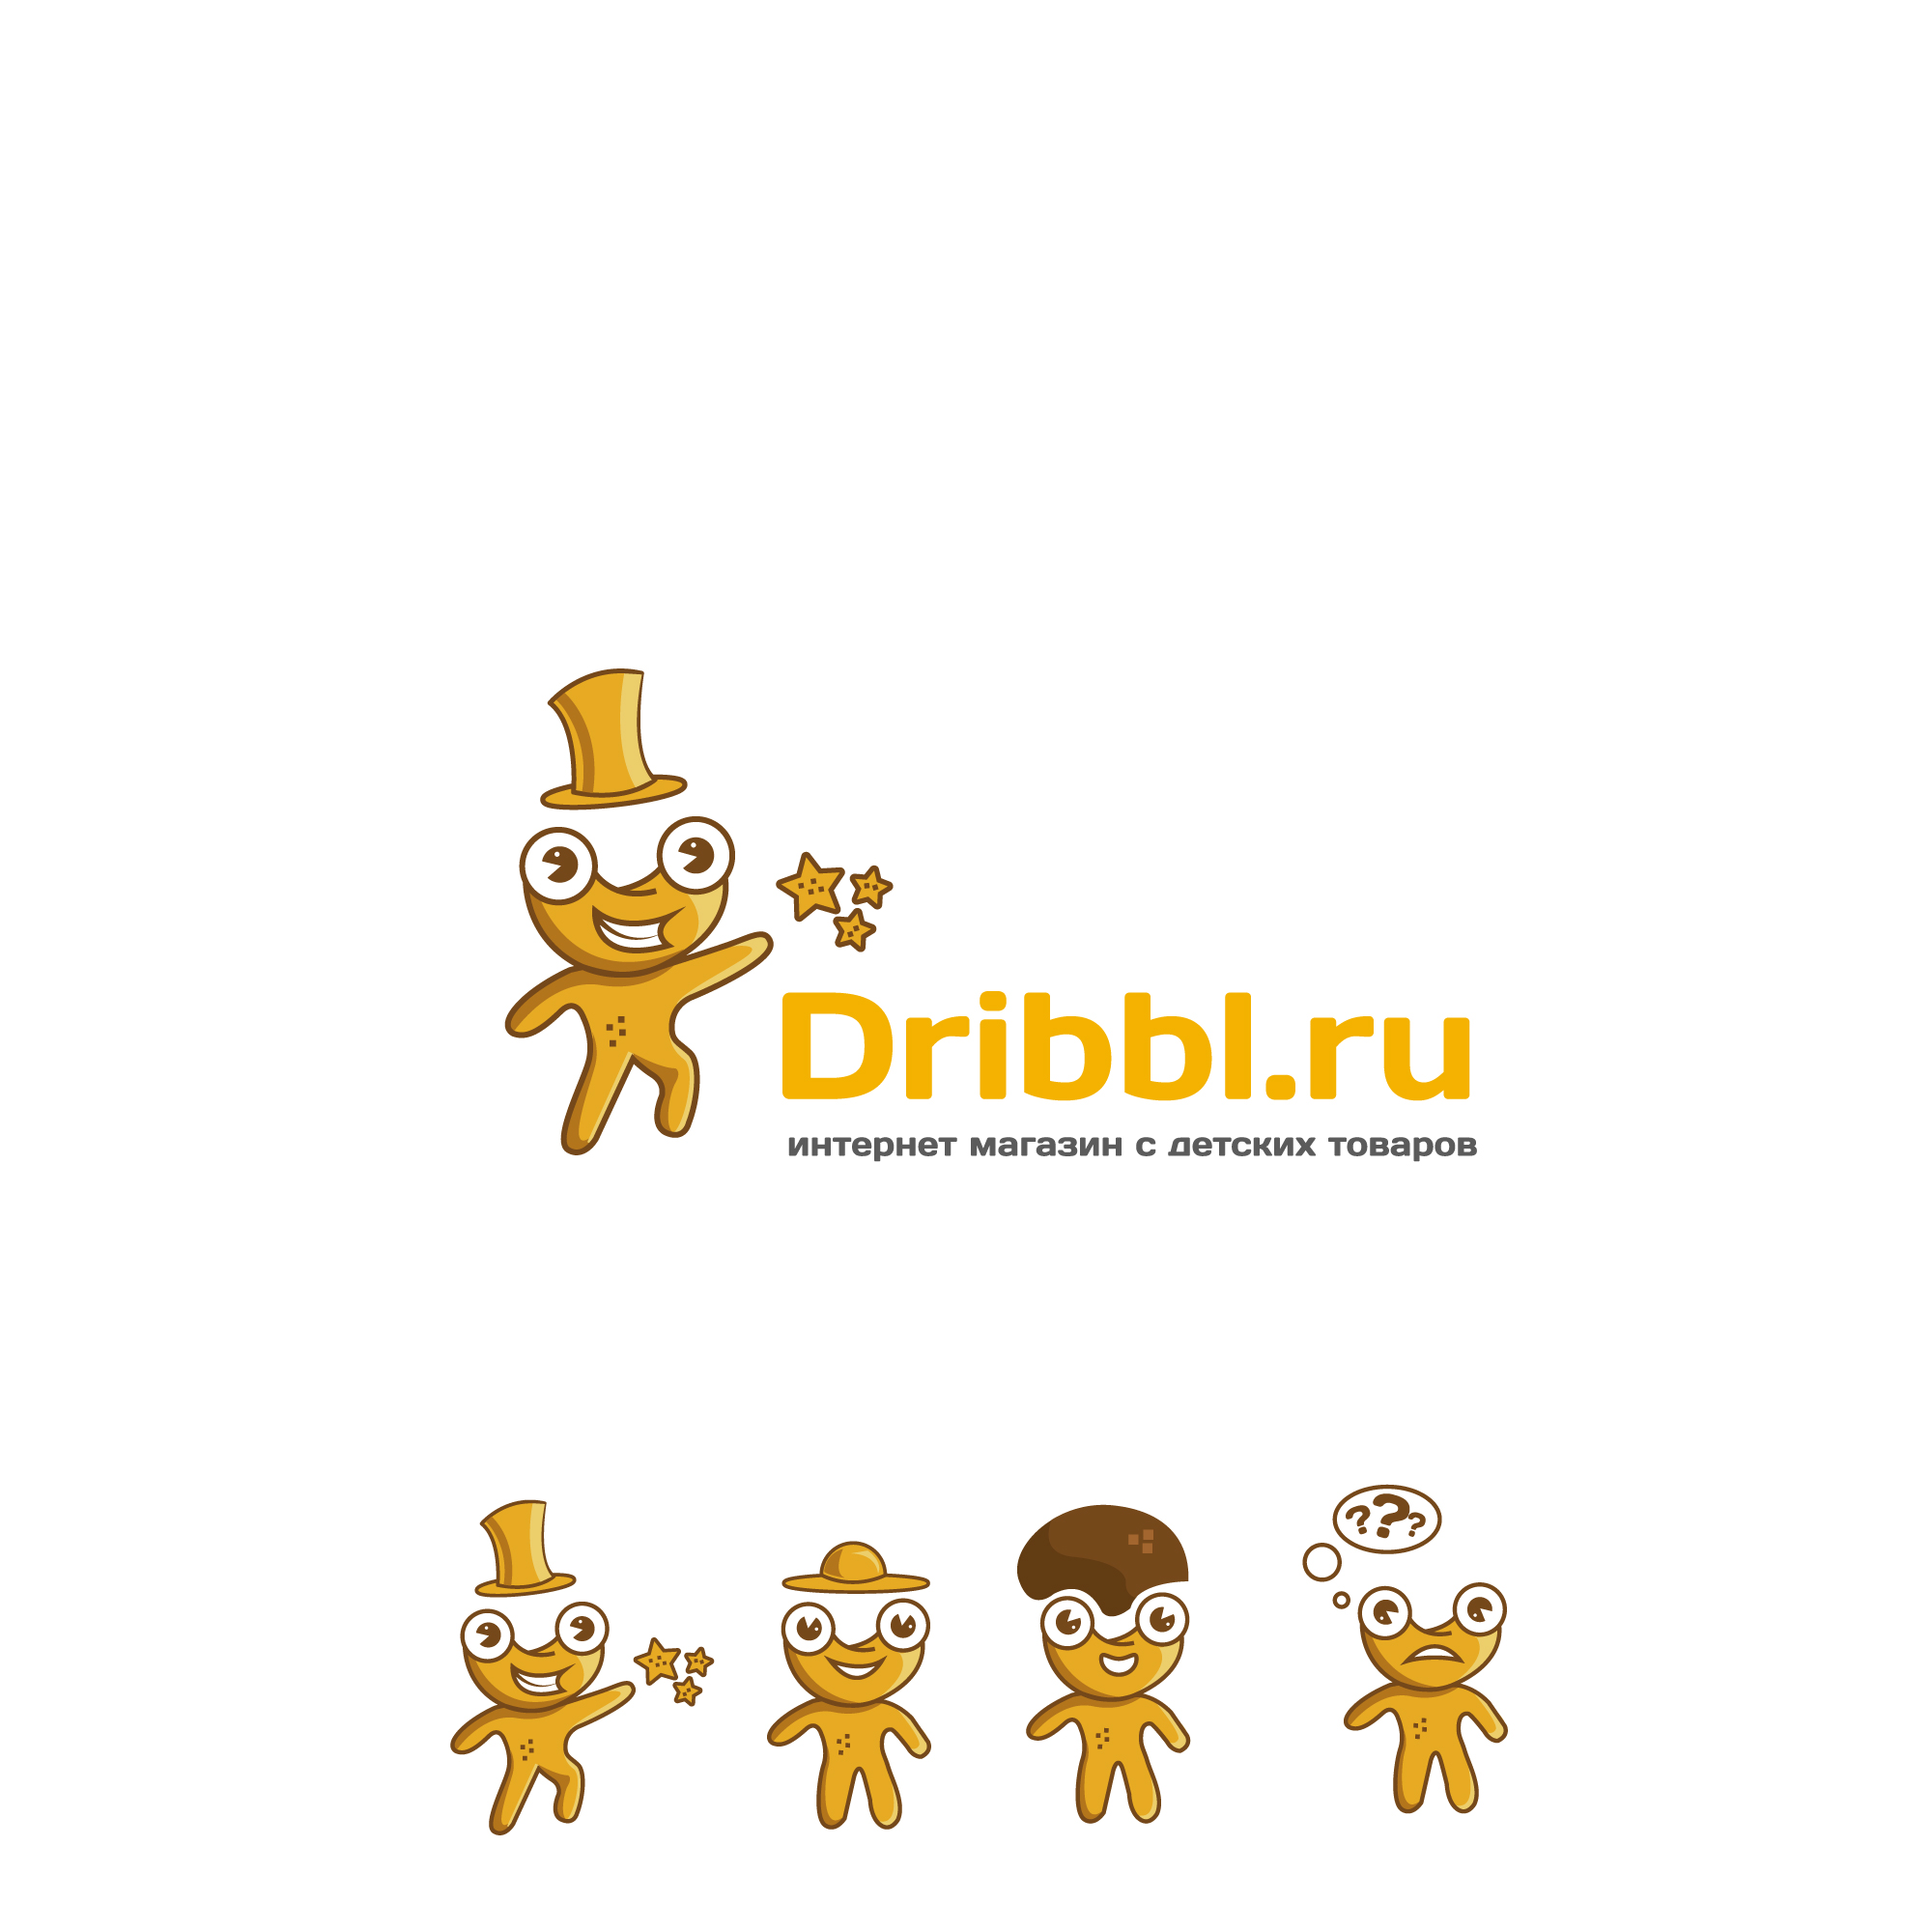 Разработка логотипа для сайта Dribbl.ru фото f_8155a9d4997077db.jpg